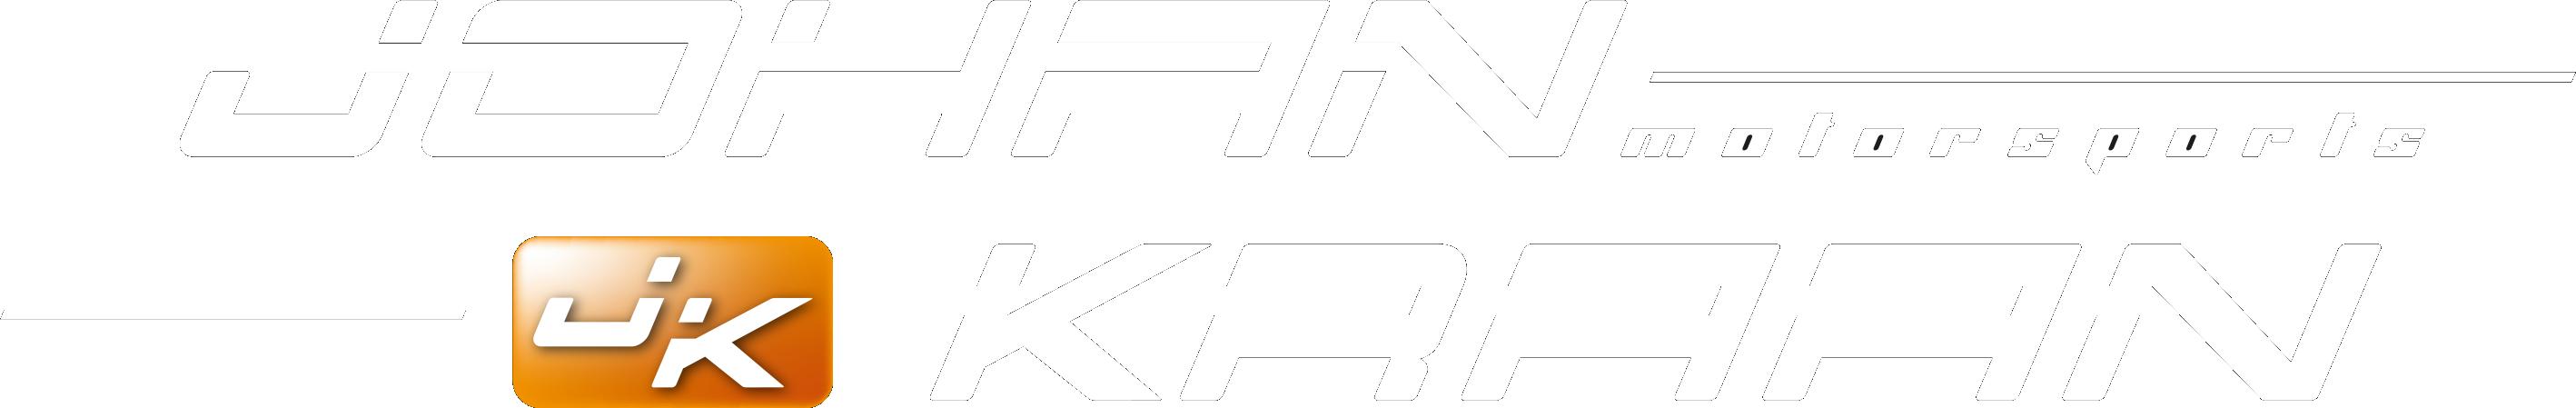 Johan Kraan Motorsports